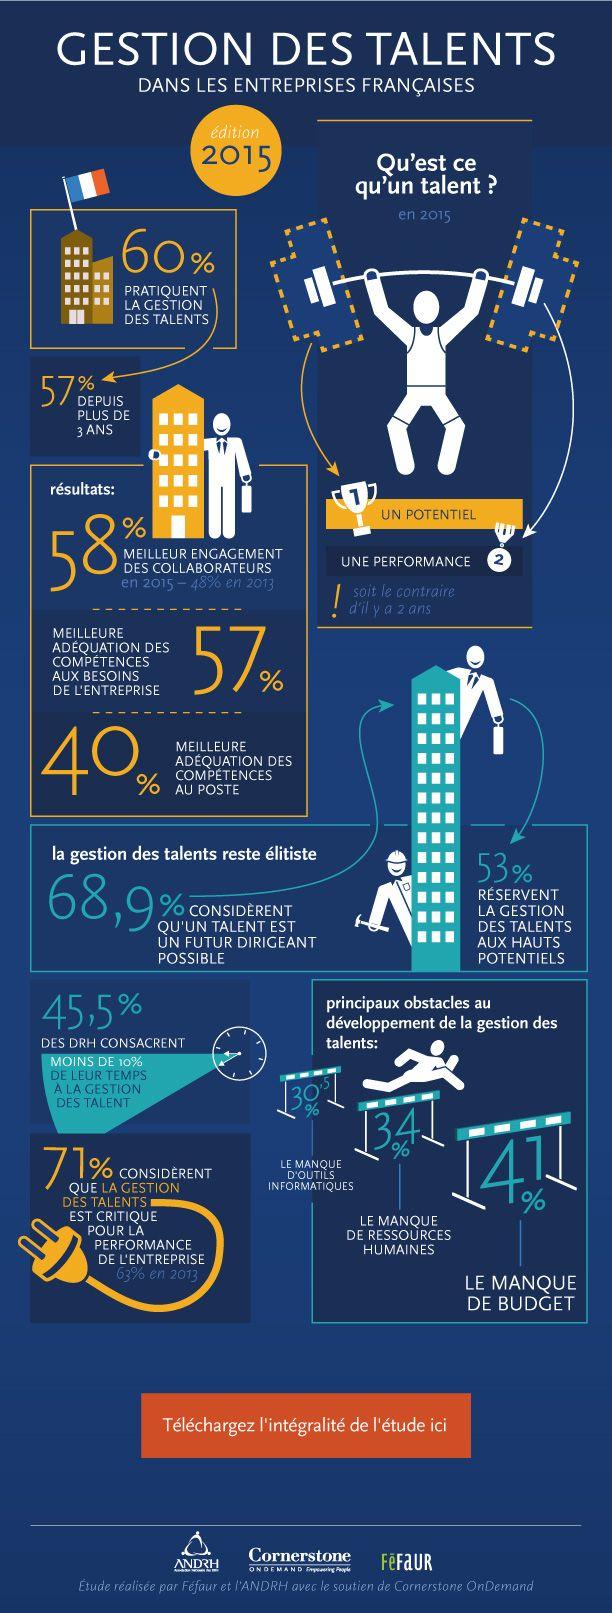 la gestion des talents en 2015 en france